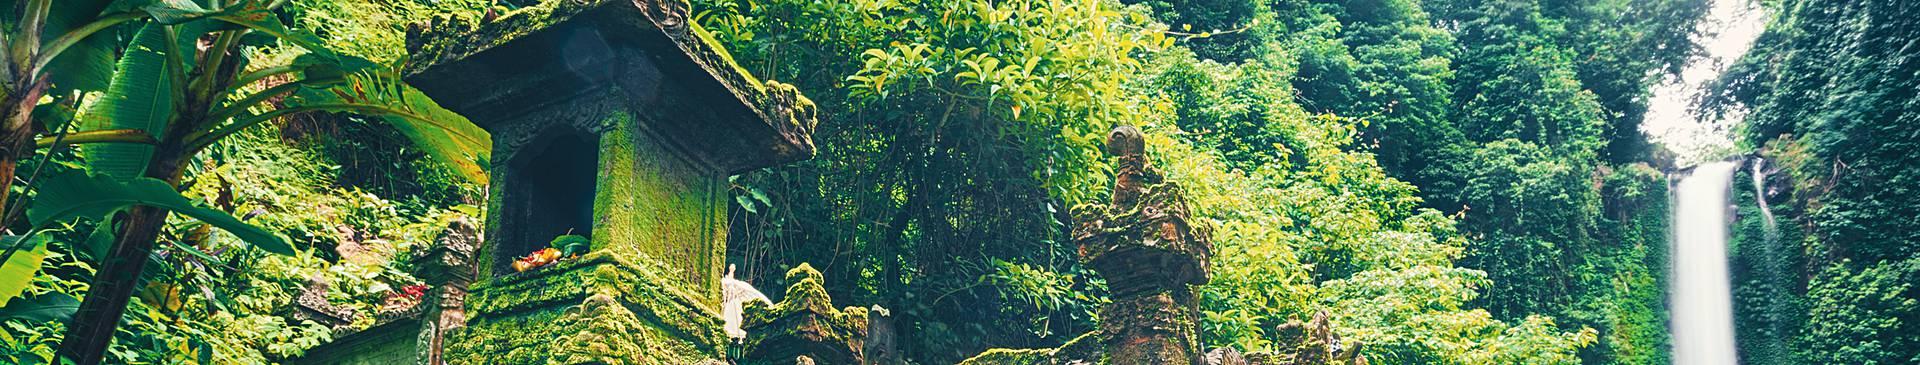 Bali rainforest tours